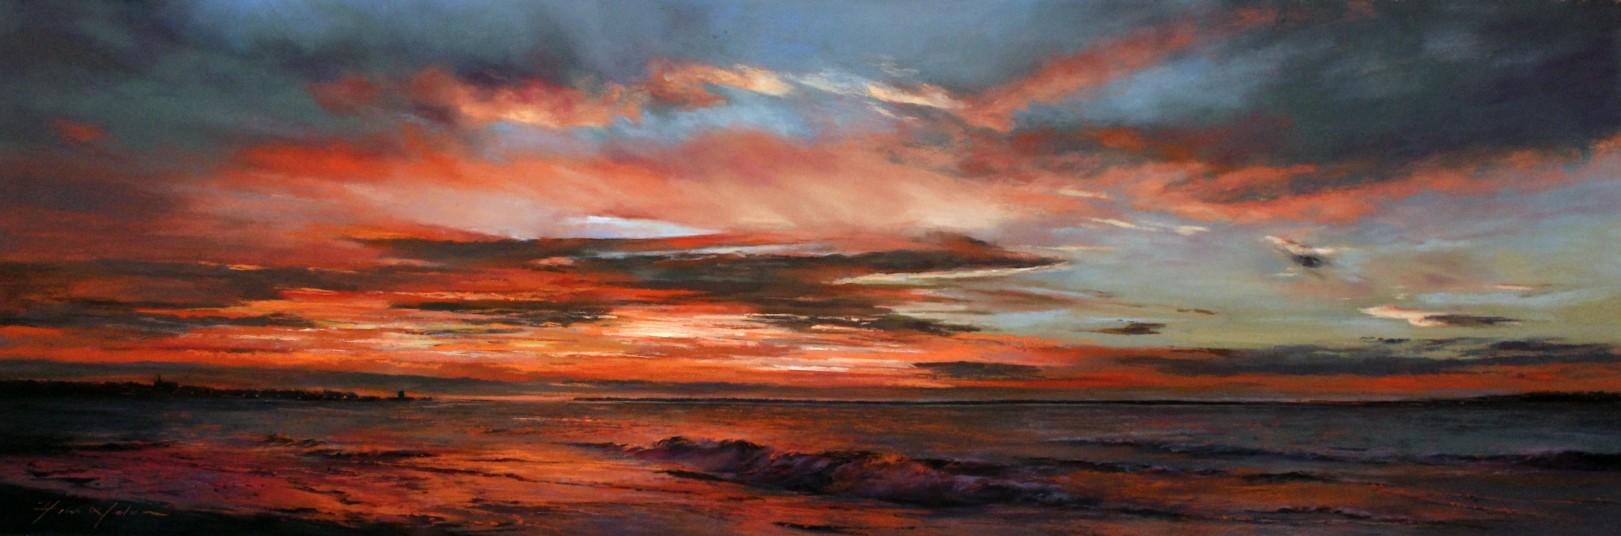 3_Fiona Haldane_Glorious Morning, Tay Estuary_Pastel_16x48